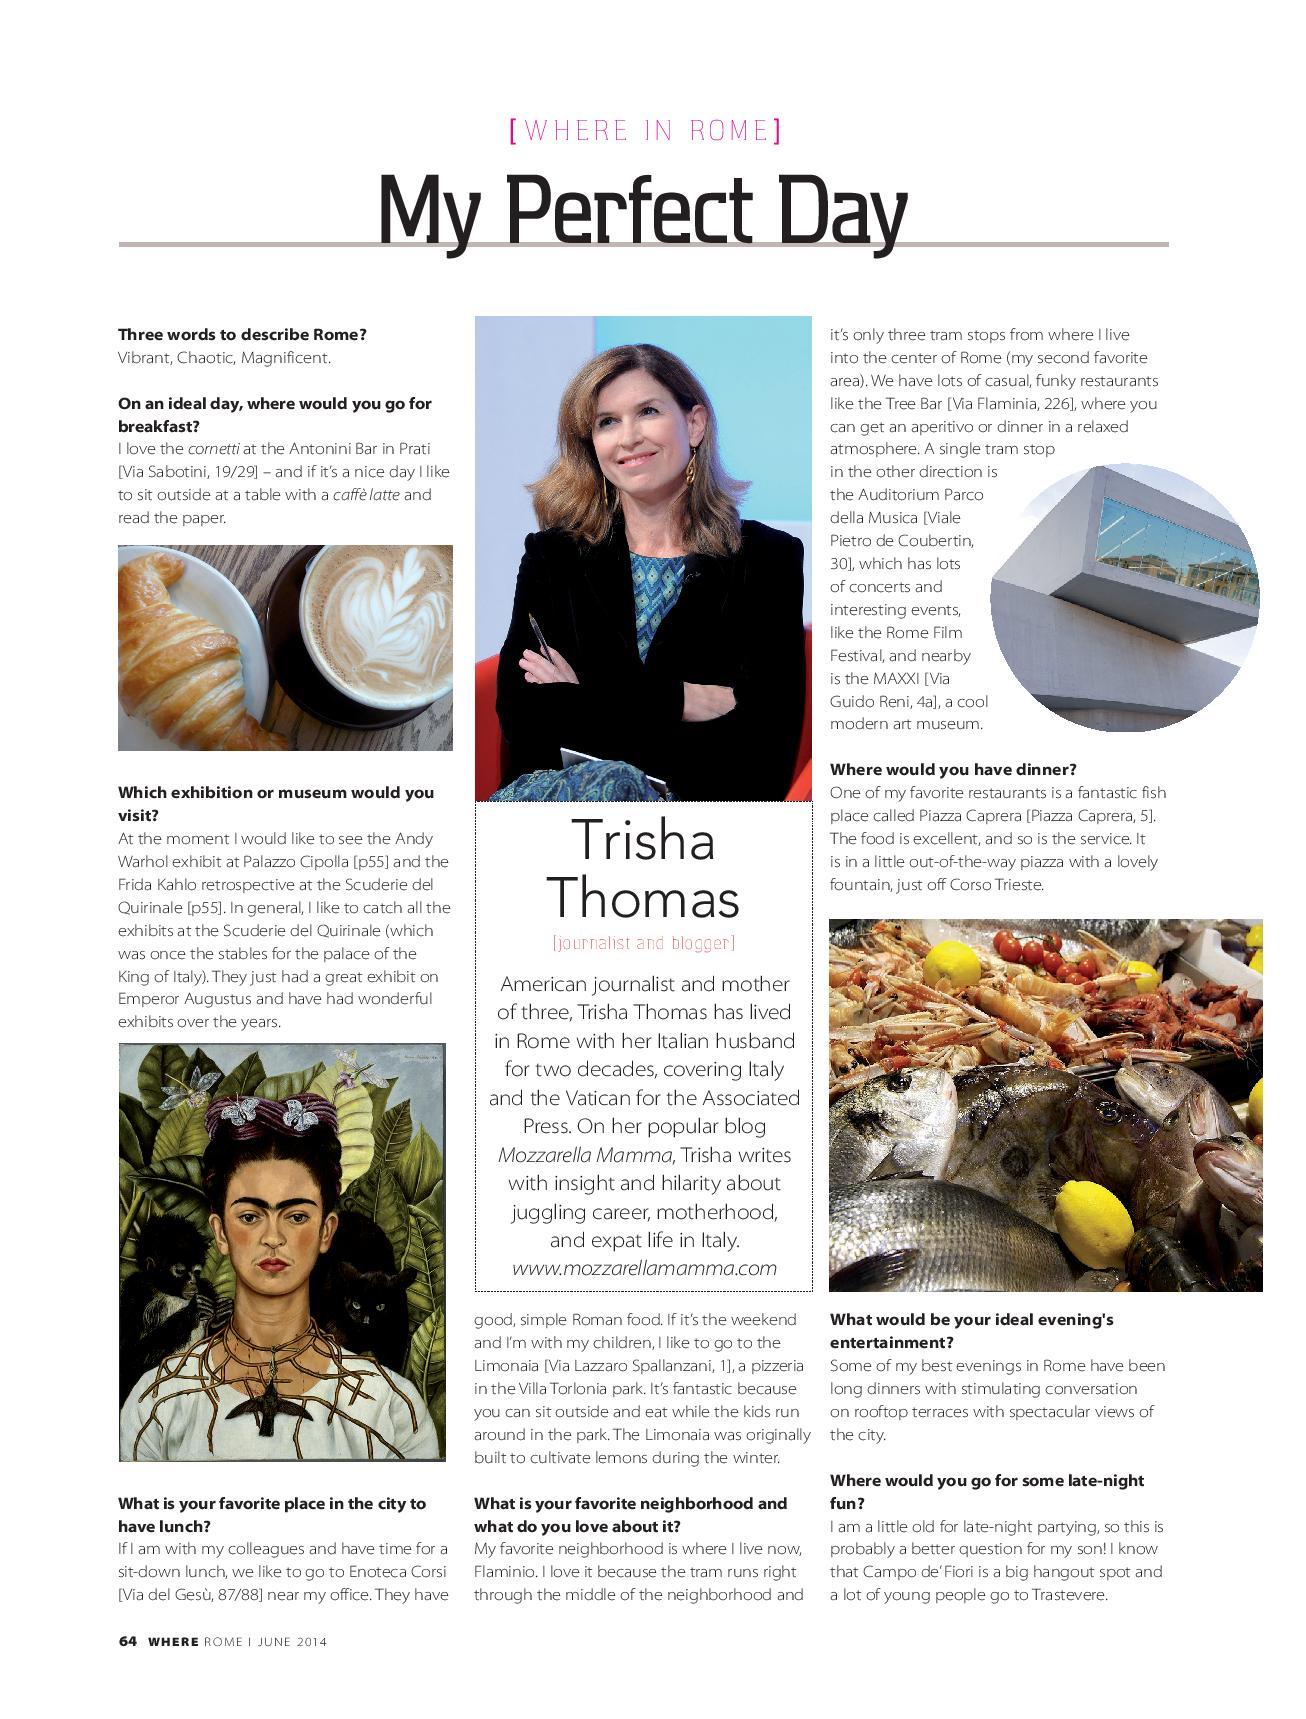 My Perfect Day, Trisha Thomas, June 2014-page-001.jpg